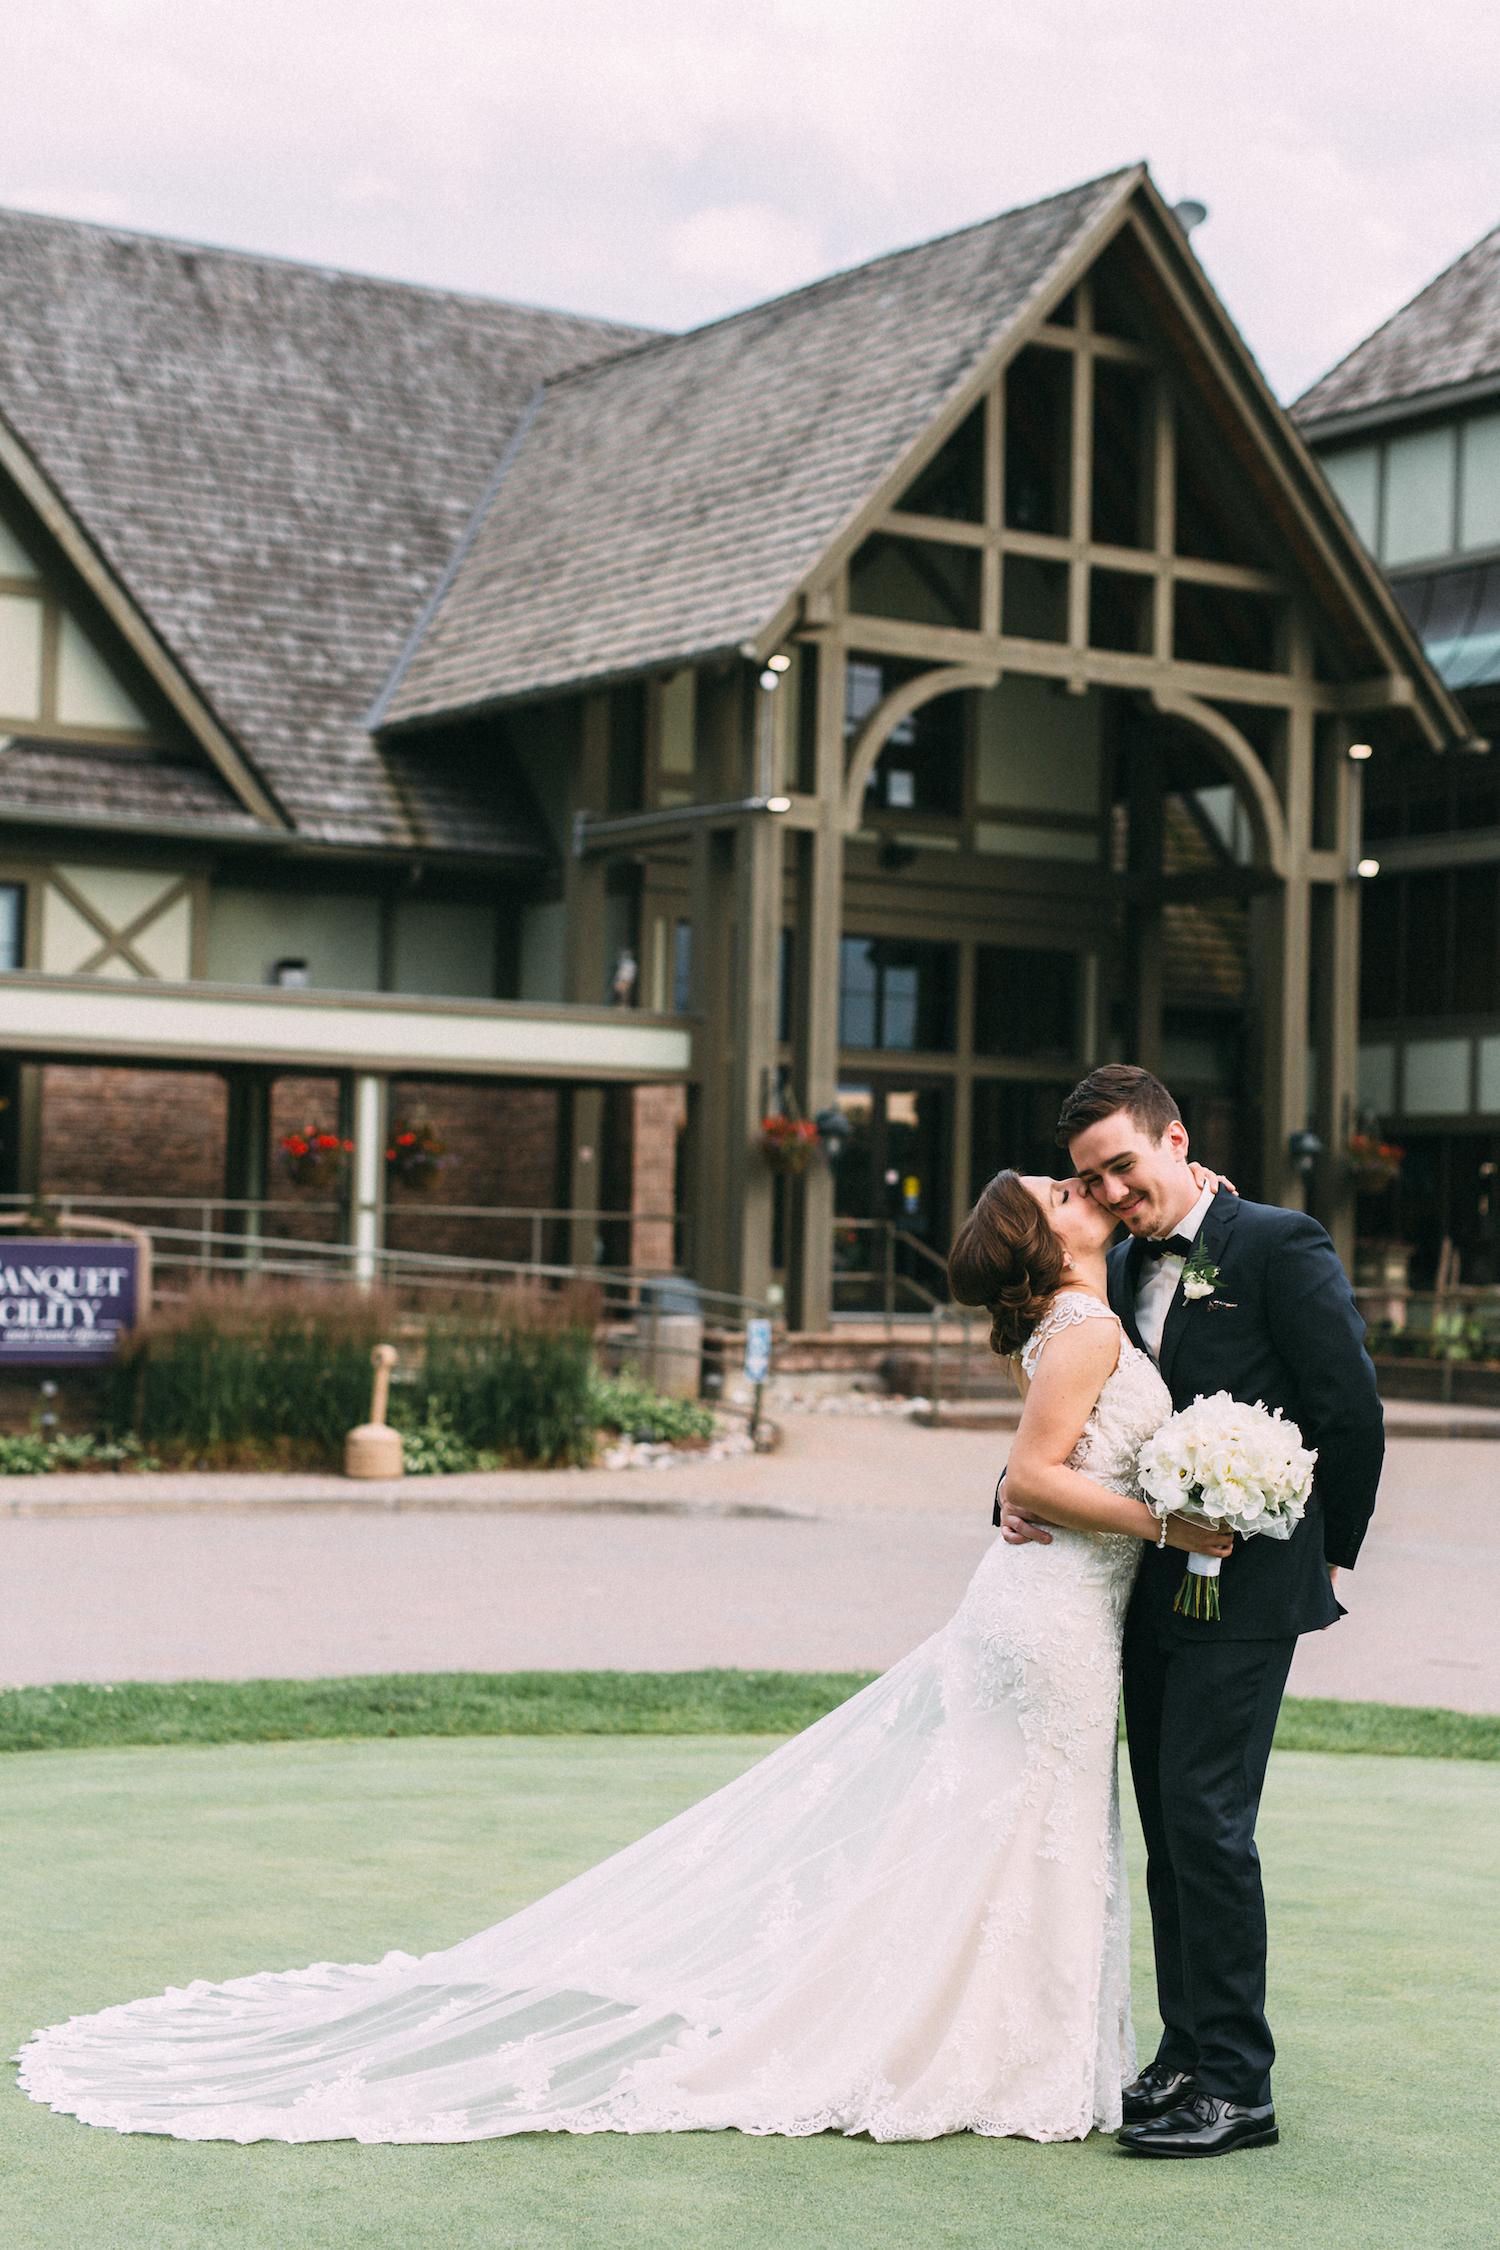 Deer Creek Golf & Banquet Facility - Deer Creek encompasses an exquisite wedding venue with breathtaking landscape that boasts natural scenic beauty.Address: 2700 Audley Rd. North, AjaxEmail: info@golfdeercreek.comContact: Ashley VandenbergPhone: (905) 427-7737 x 247Website: www.eventsdeercreek.cominstagram ~ facebook ~ twitter